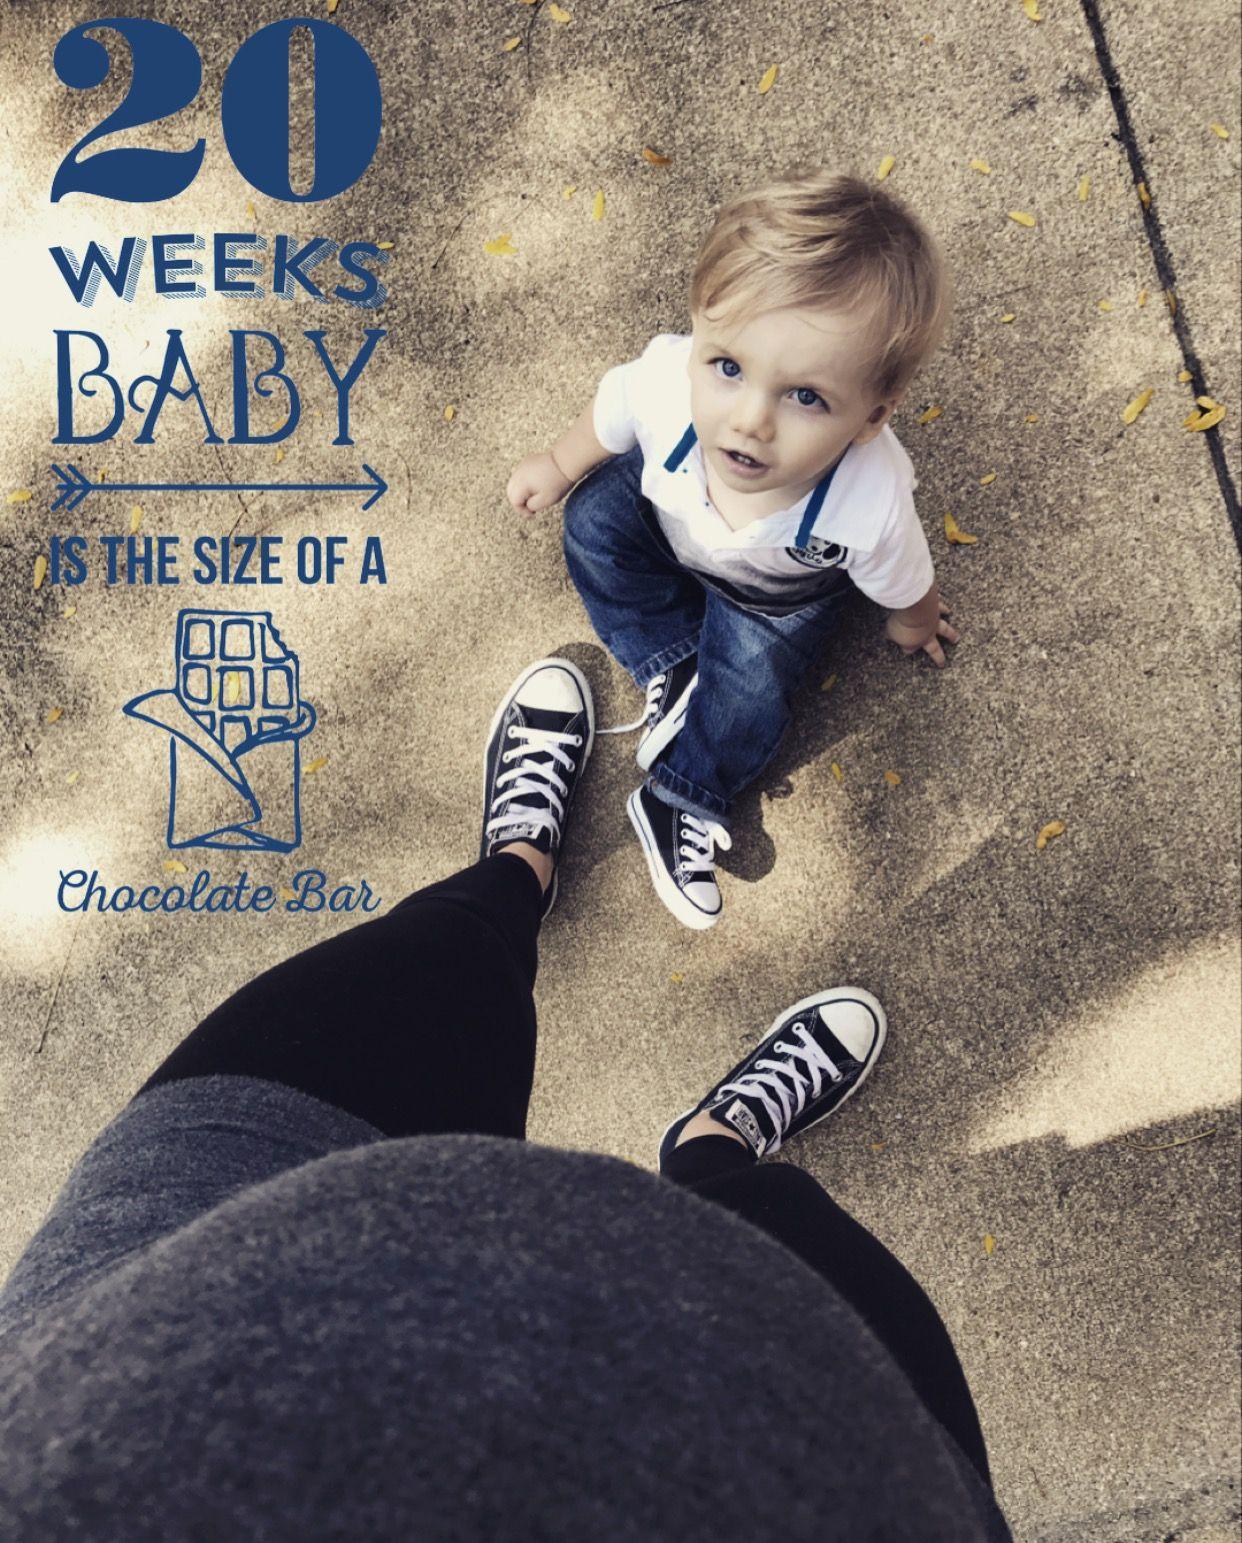 7 icdn.ru girls.com lovefun 5 months pregnant maternity monthly photo #20weeks #chocolatebar